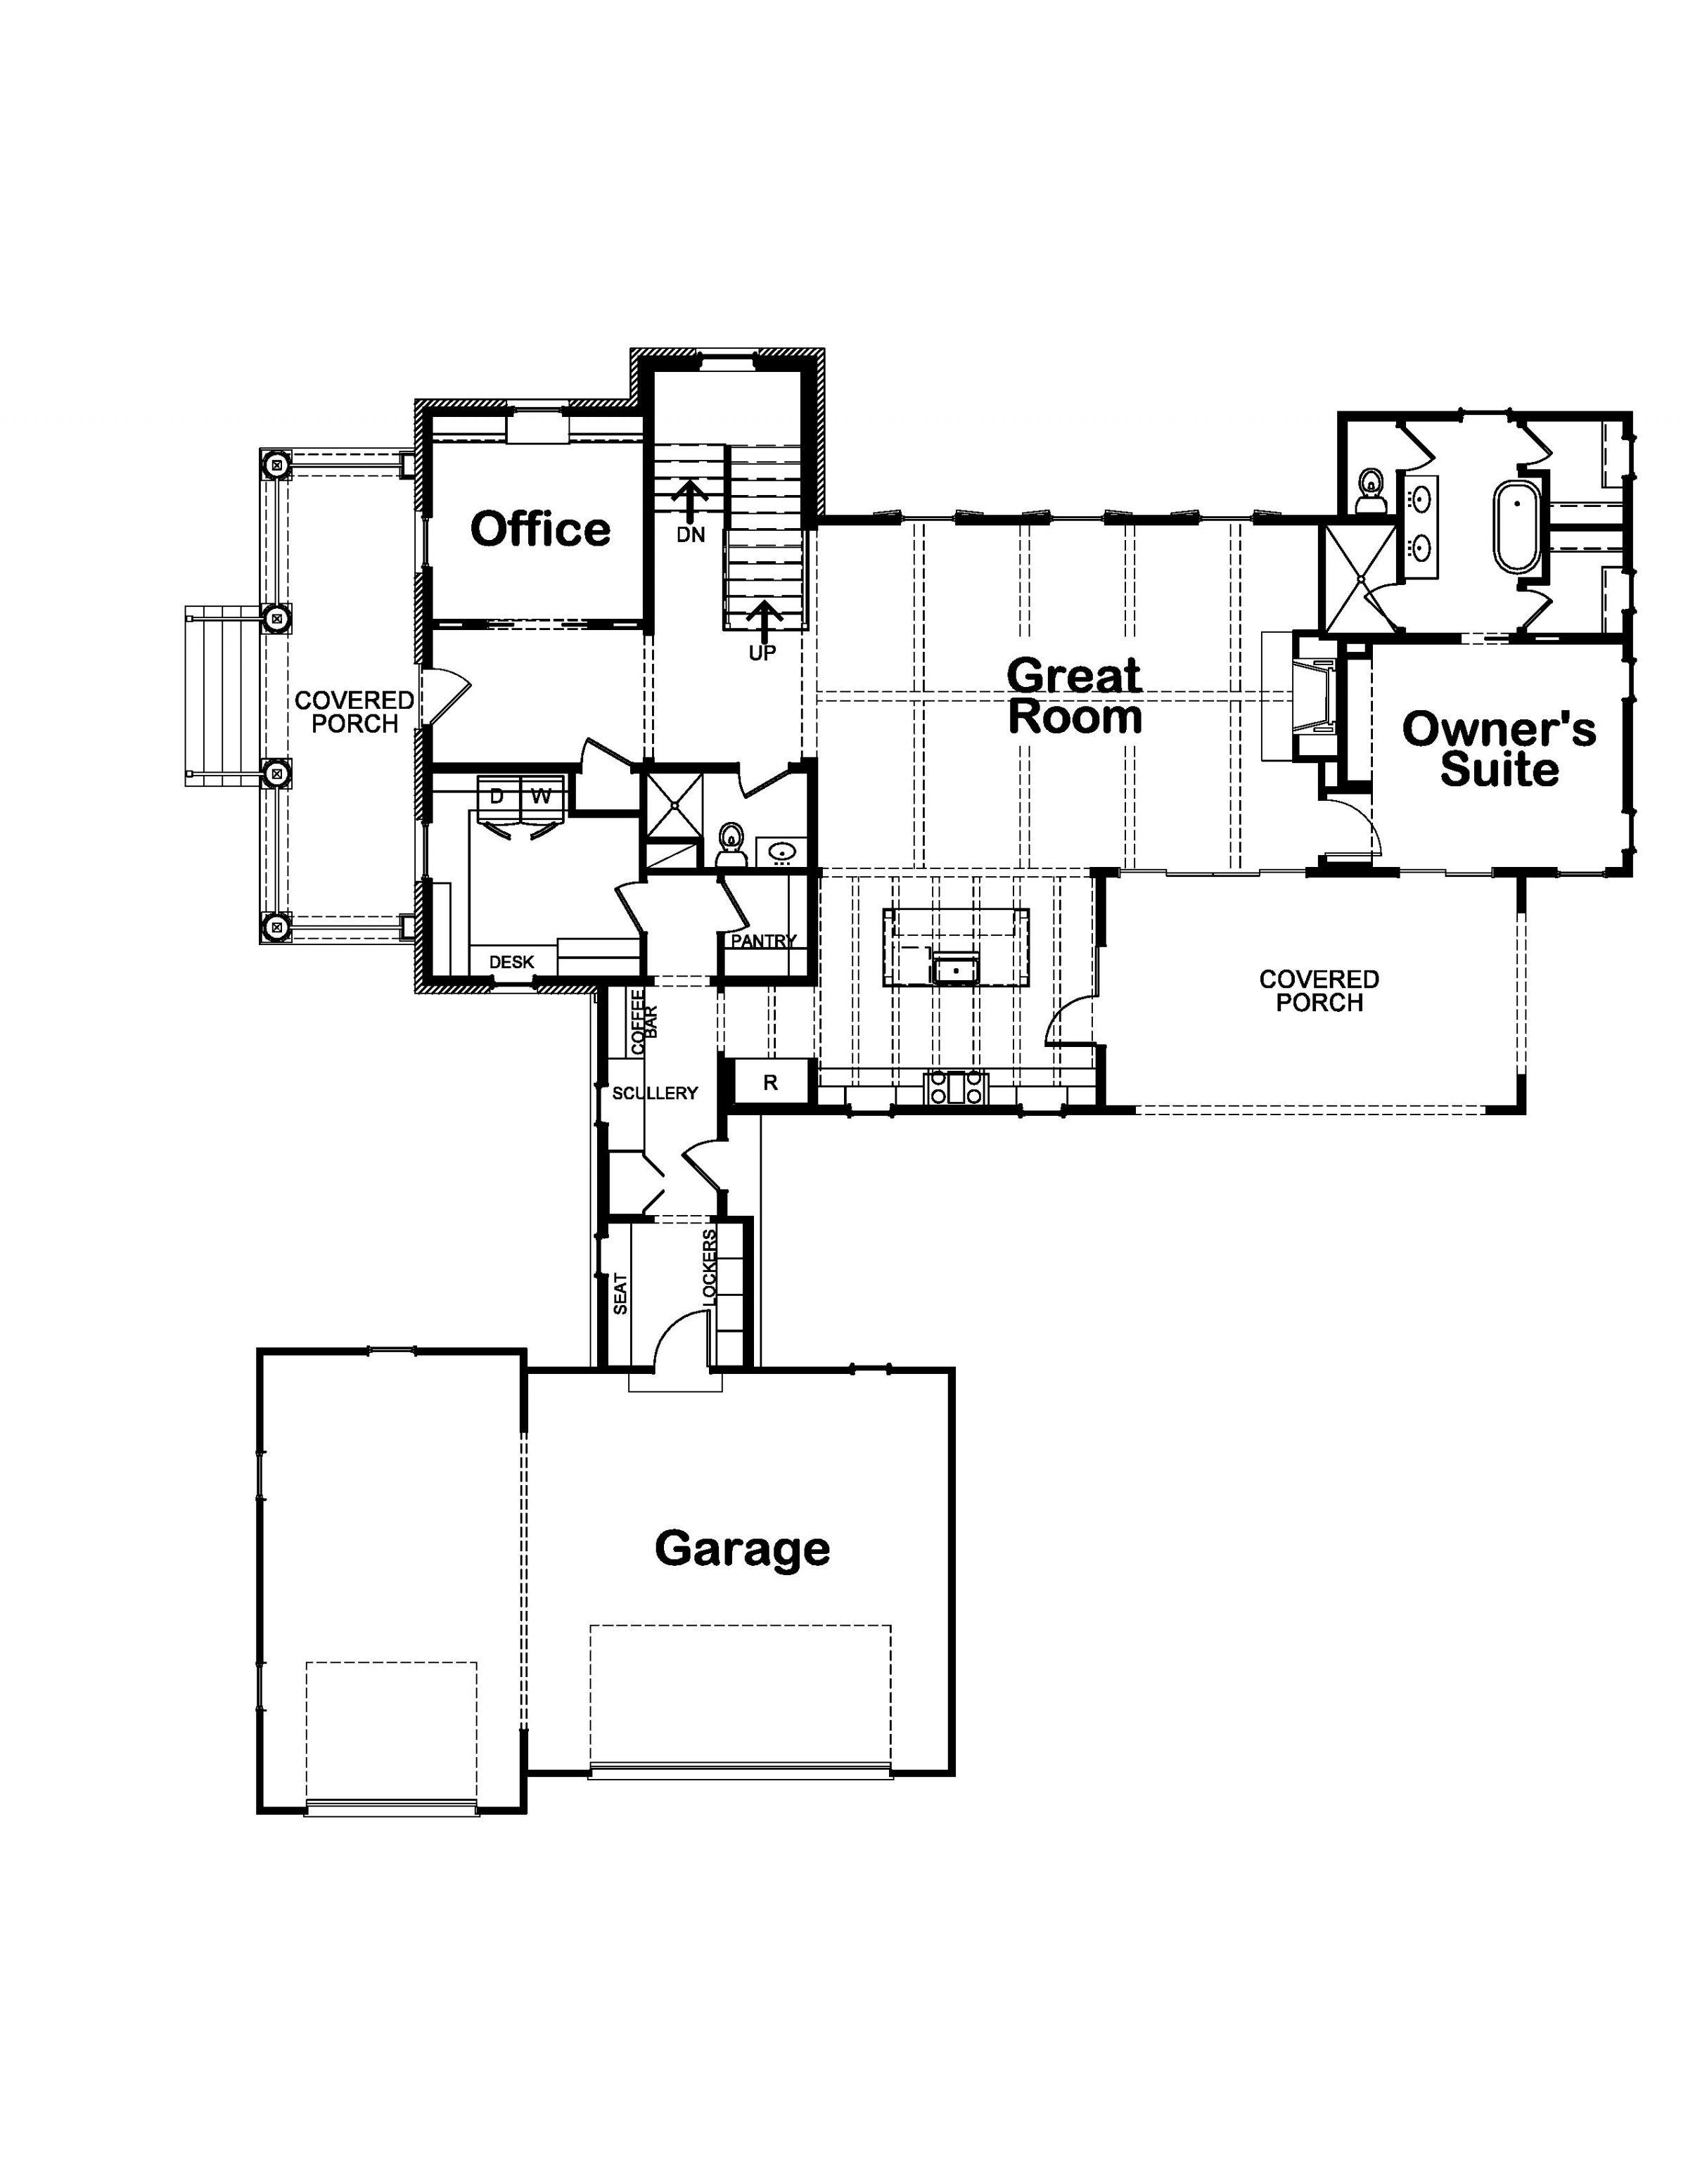 residential-warren-county-iowa-1-acres-listing-number-15524-2-2021-05-27-201727.jpg